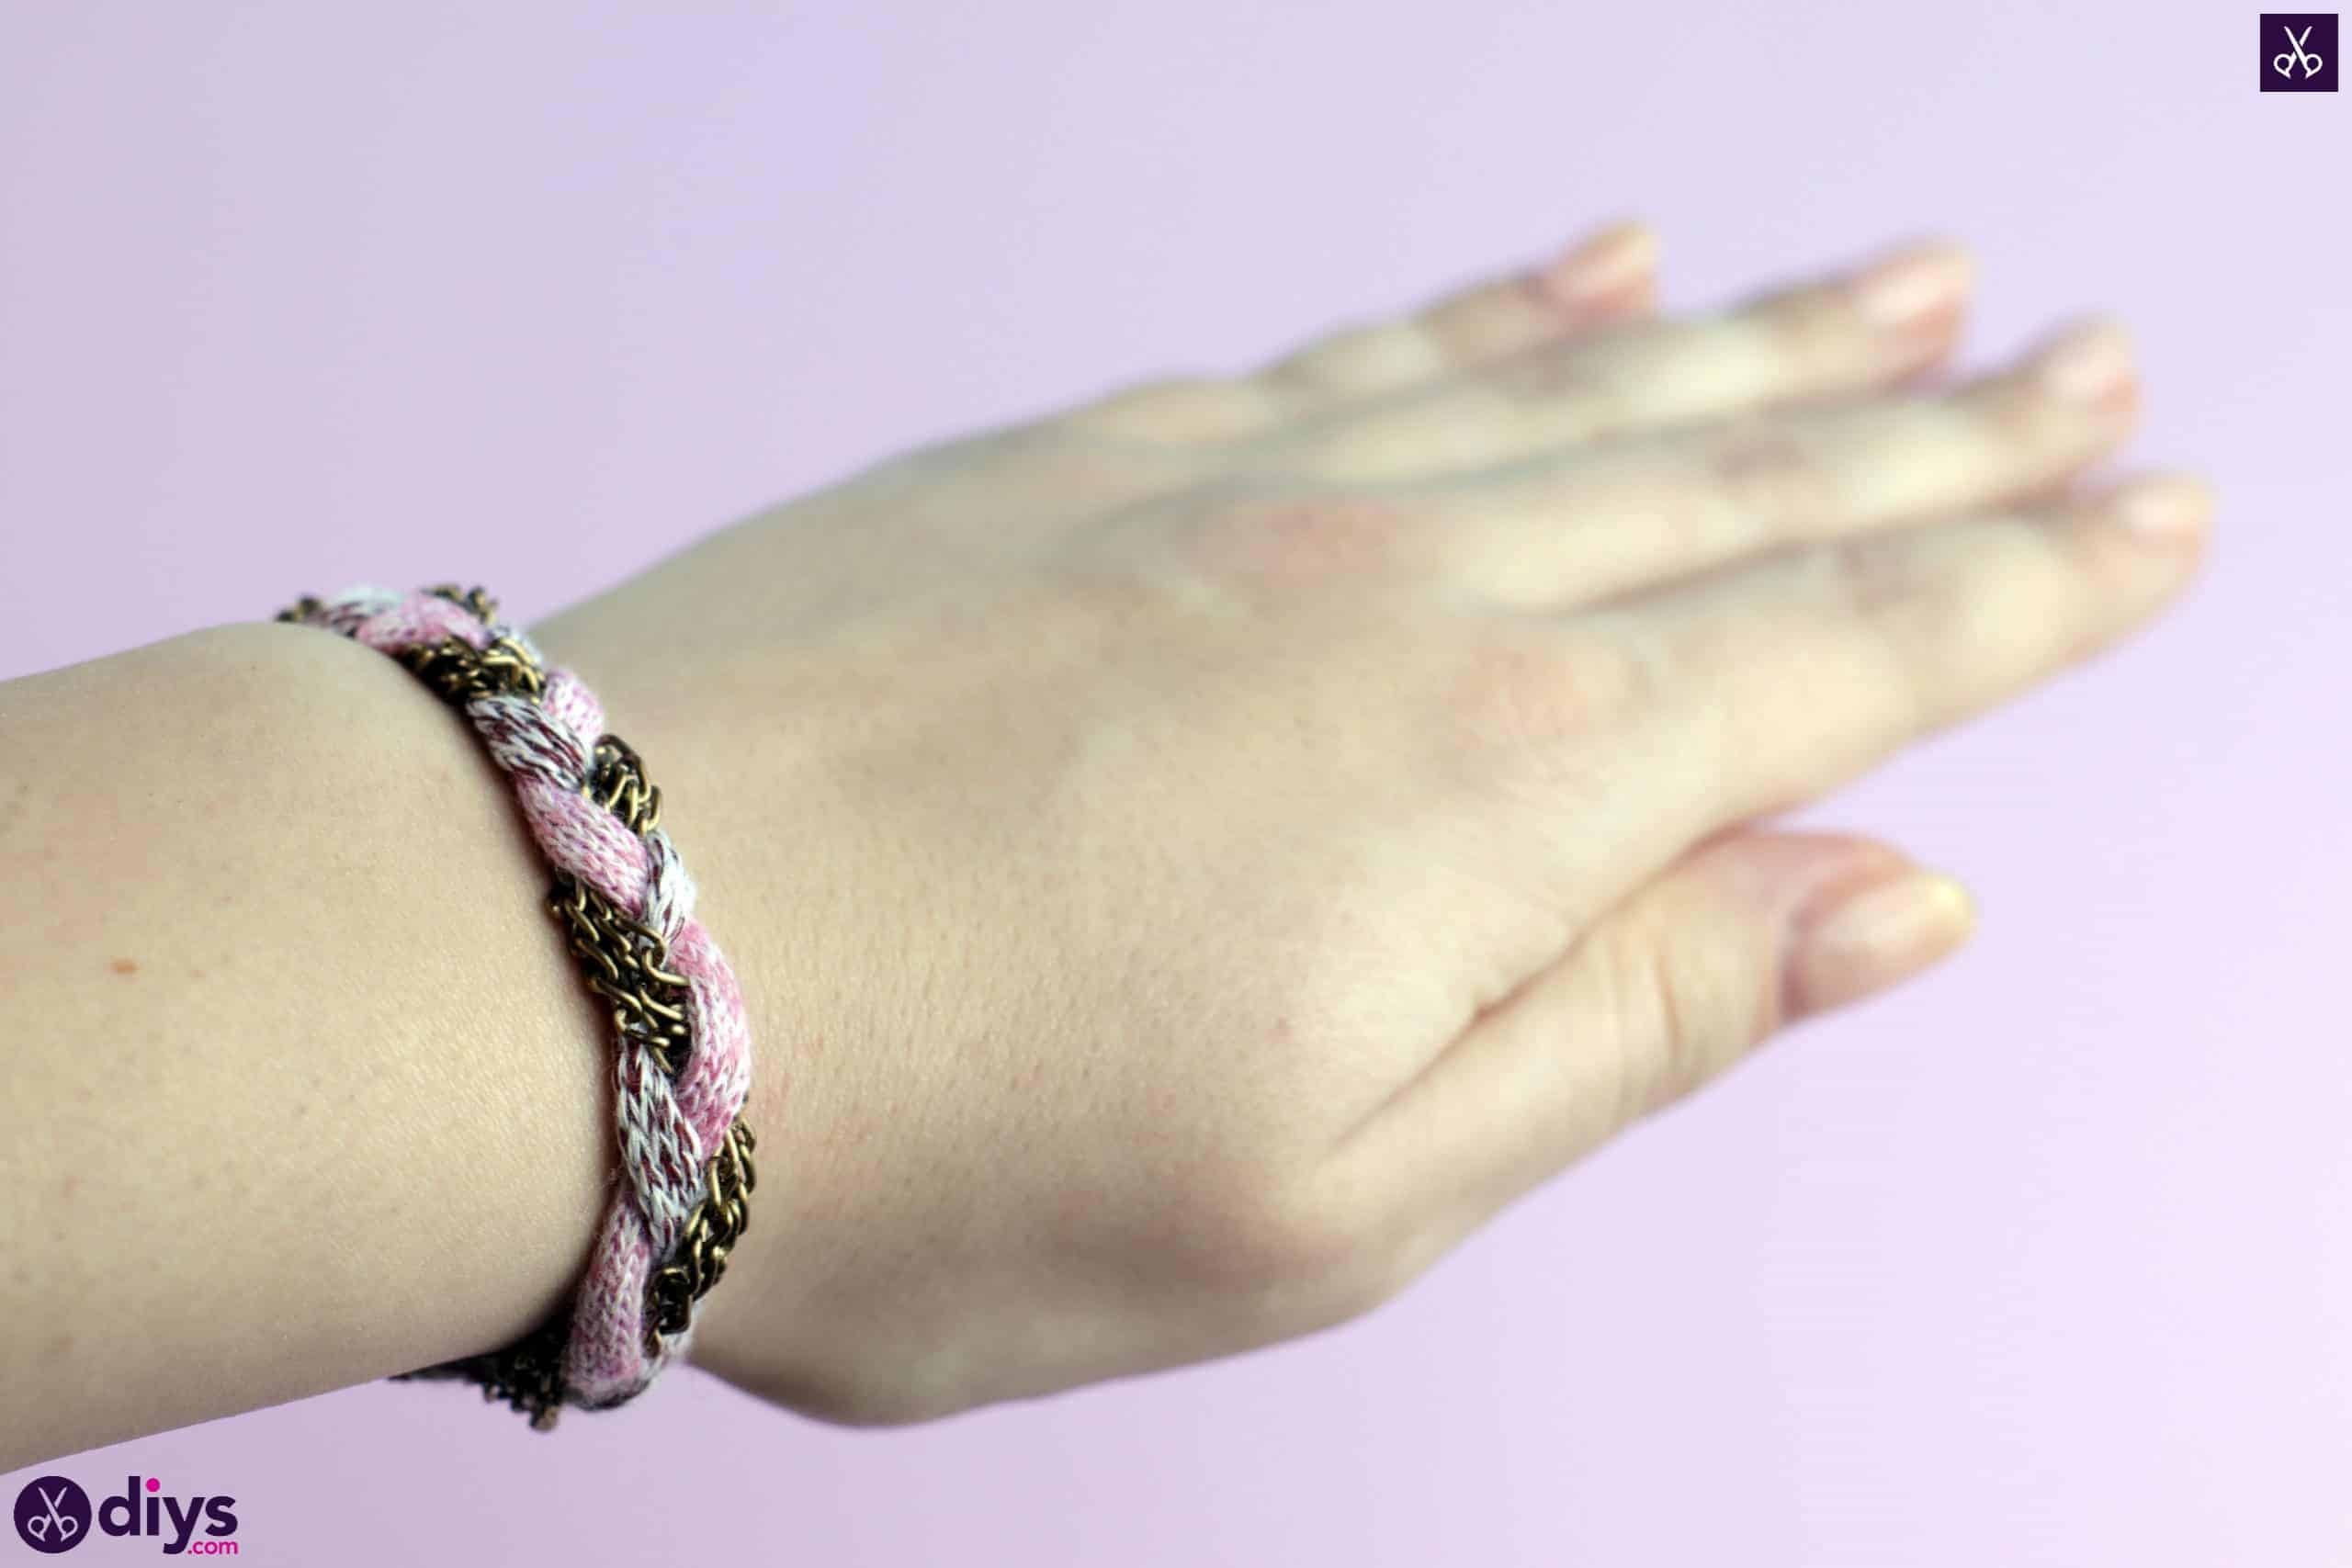 Yarn and chain bracelet craft